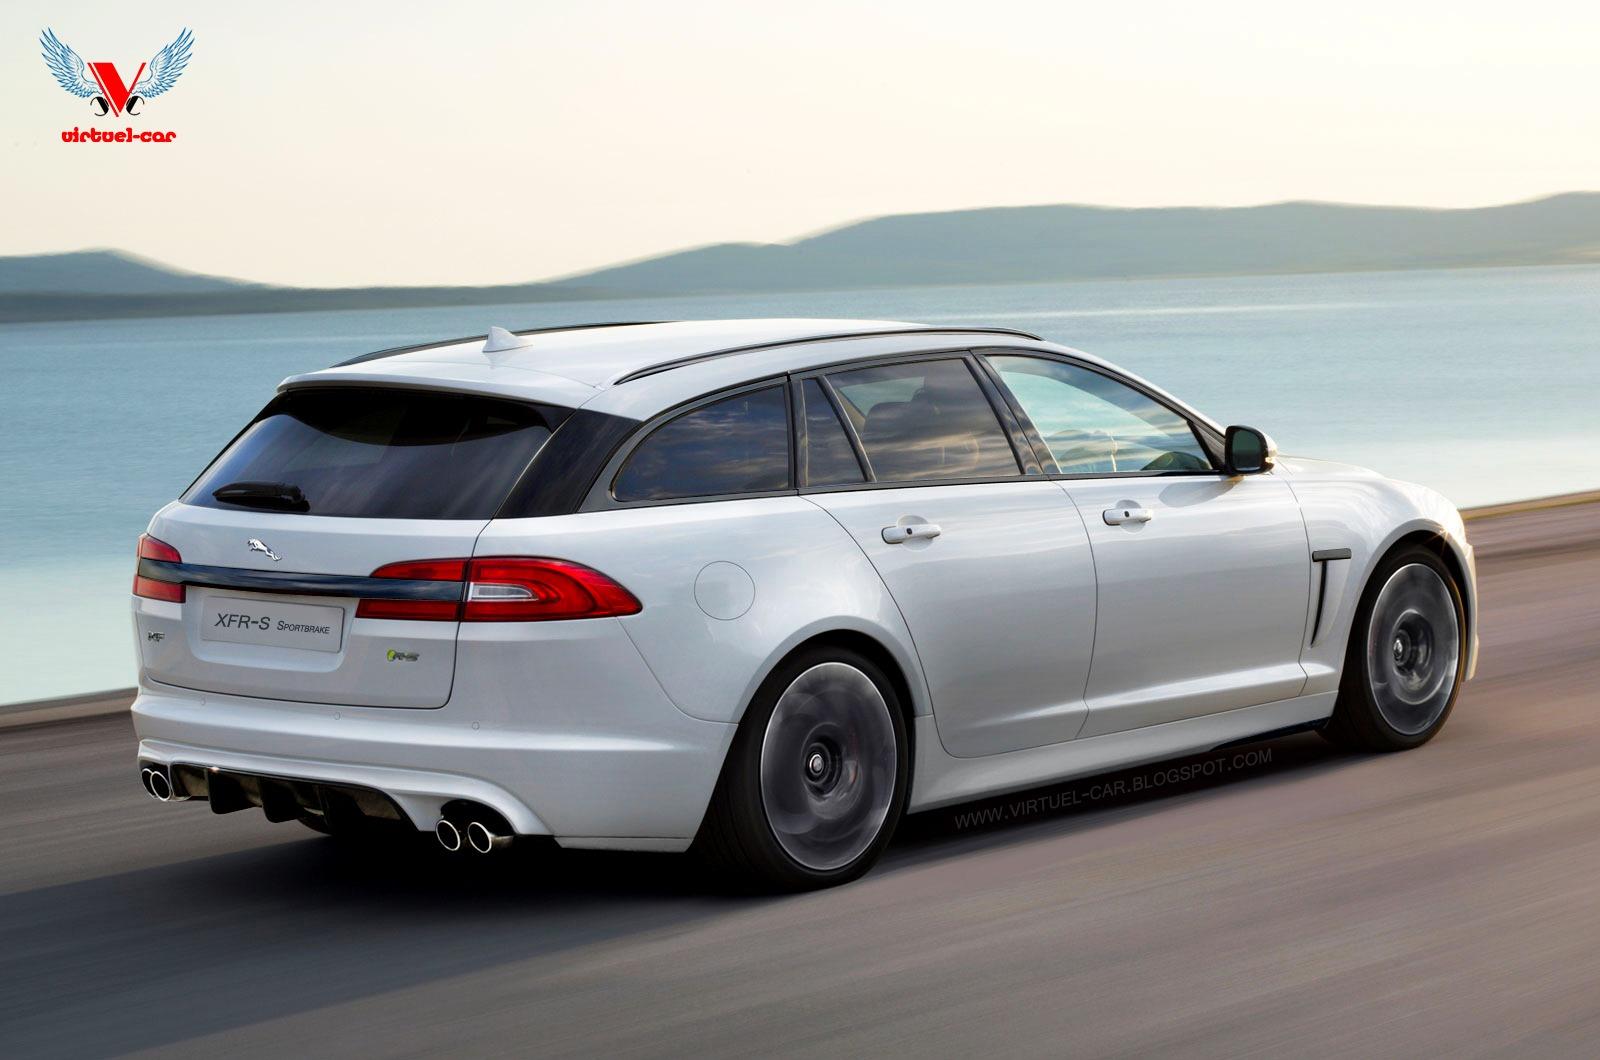 Jaguar xfr s sportbrake - photo#6